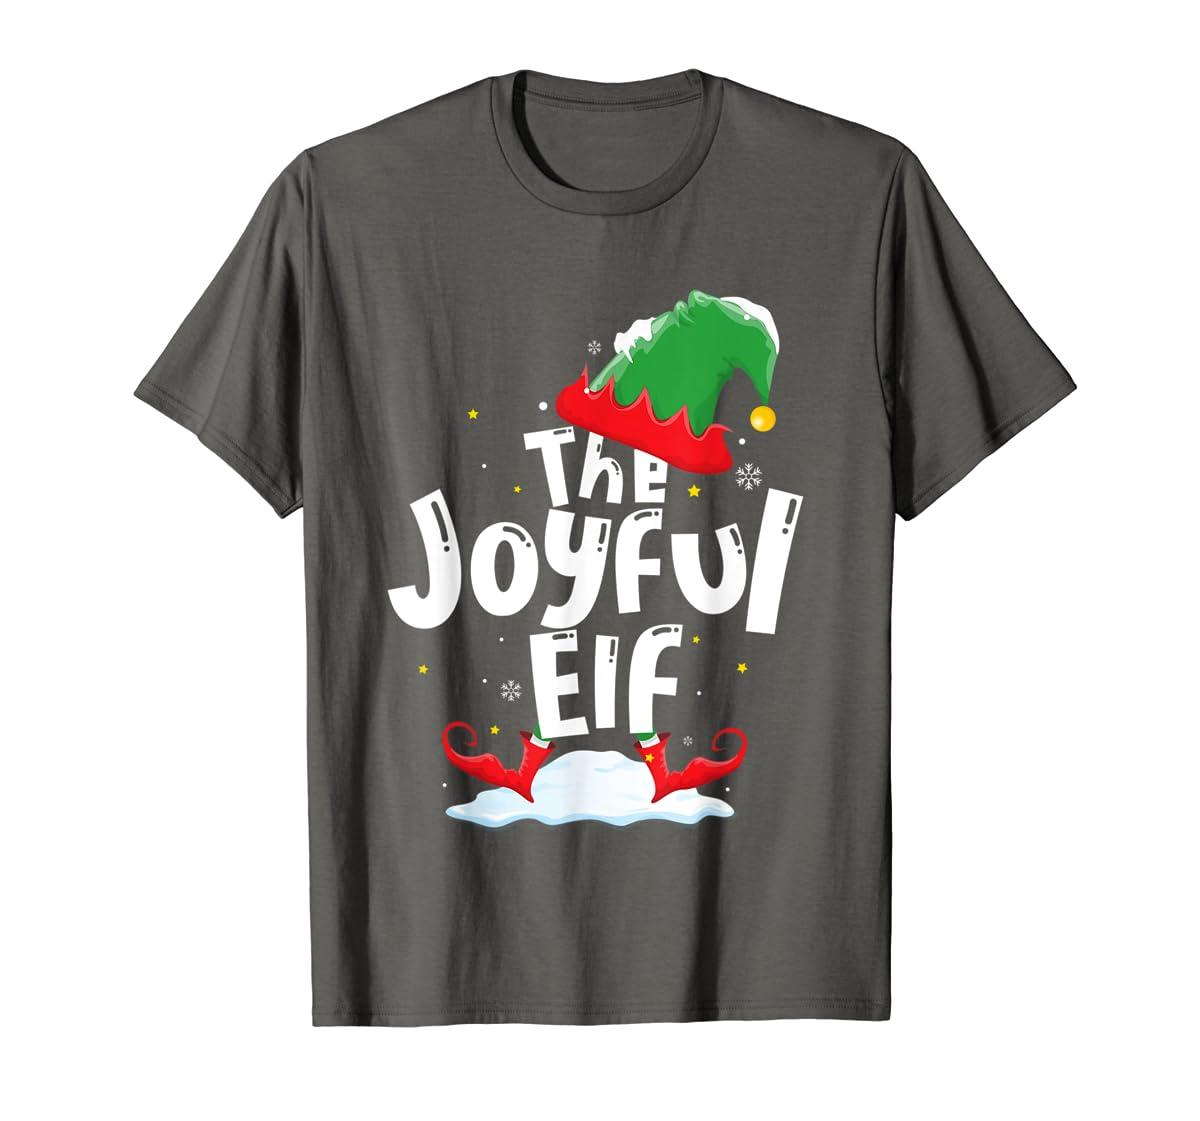 The Joyful Elf Group Matching Family Christmas Gifts Holiday T-Shirt-Men's T-Shirt-Dark Heather